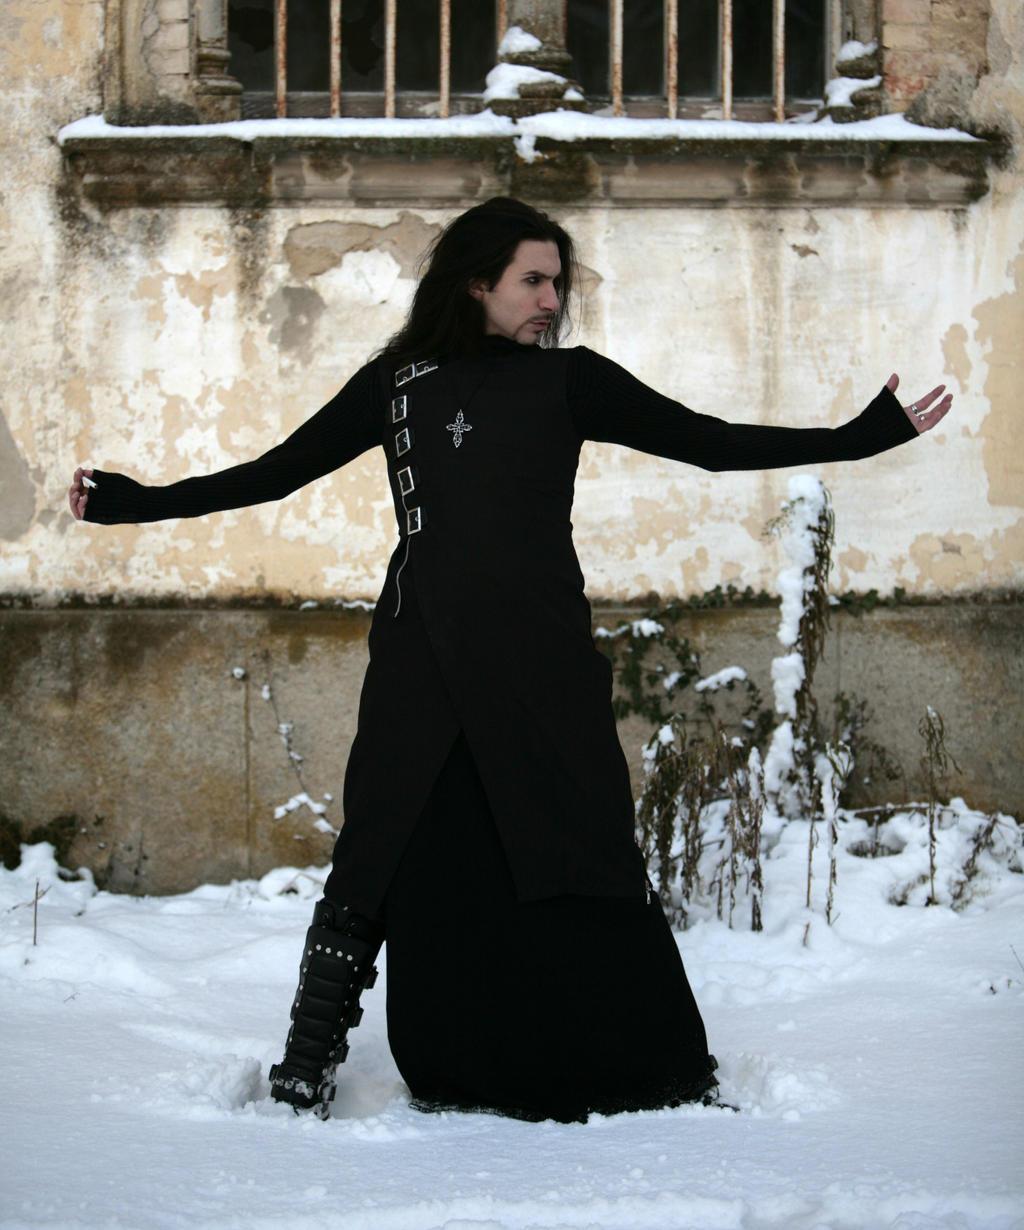 Goth Man Pose by deswitath